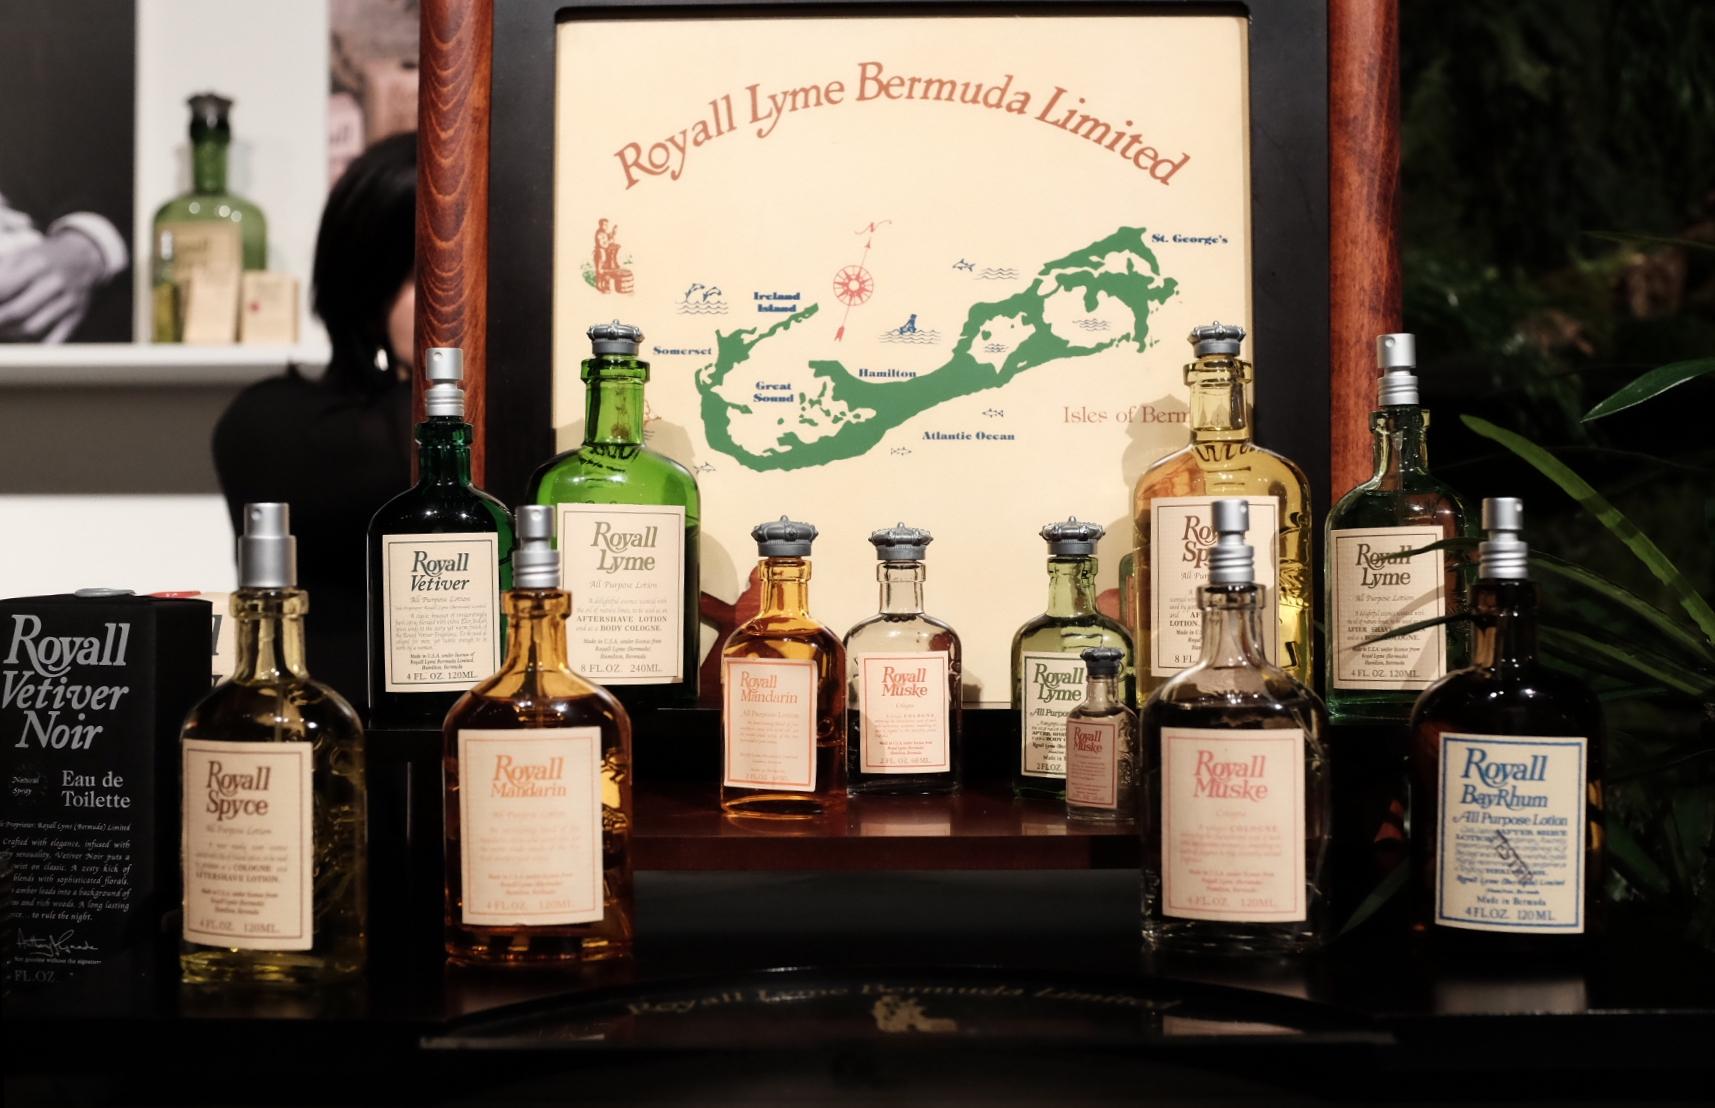 Royall Lyme Bermuda Limited